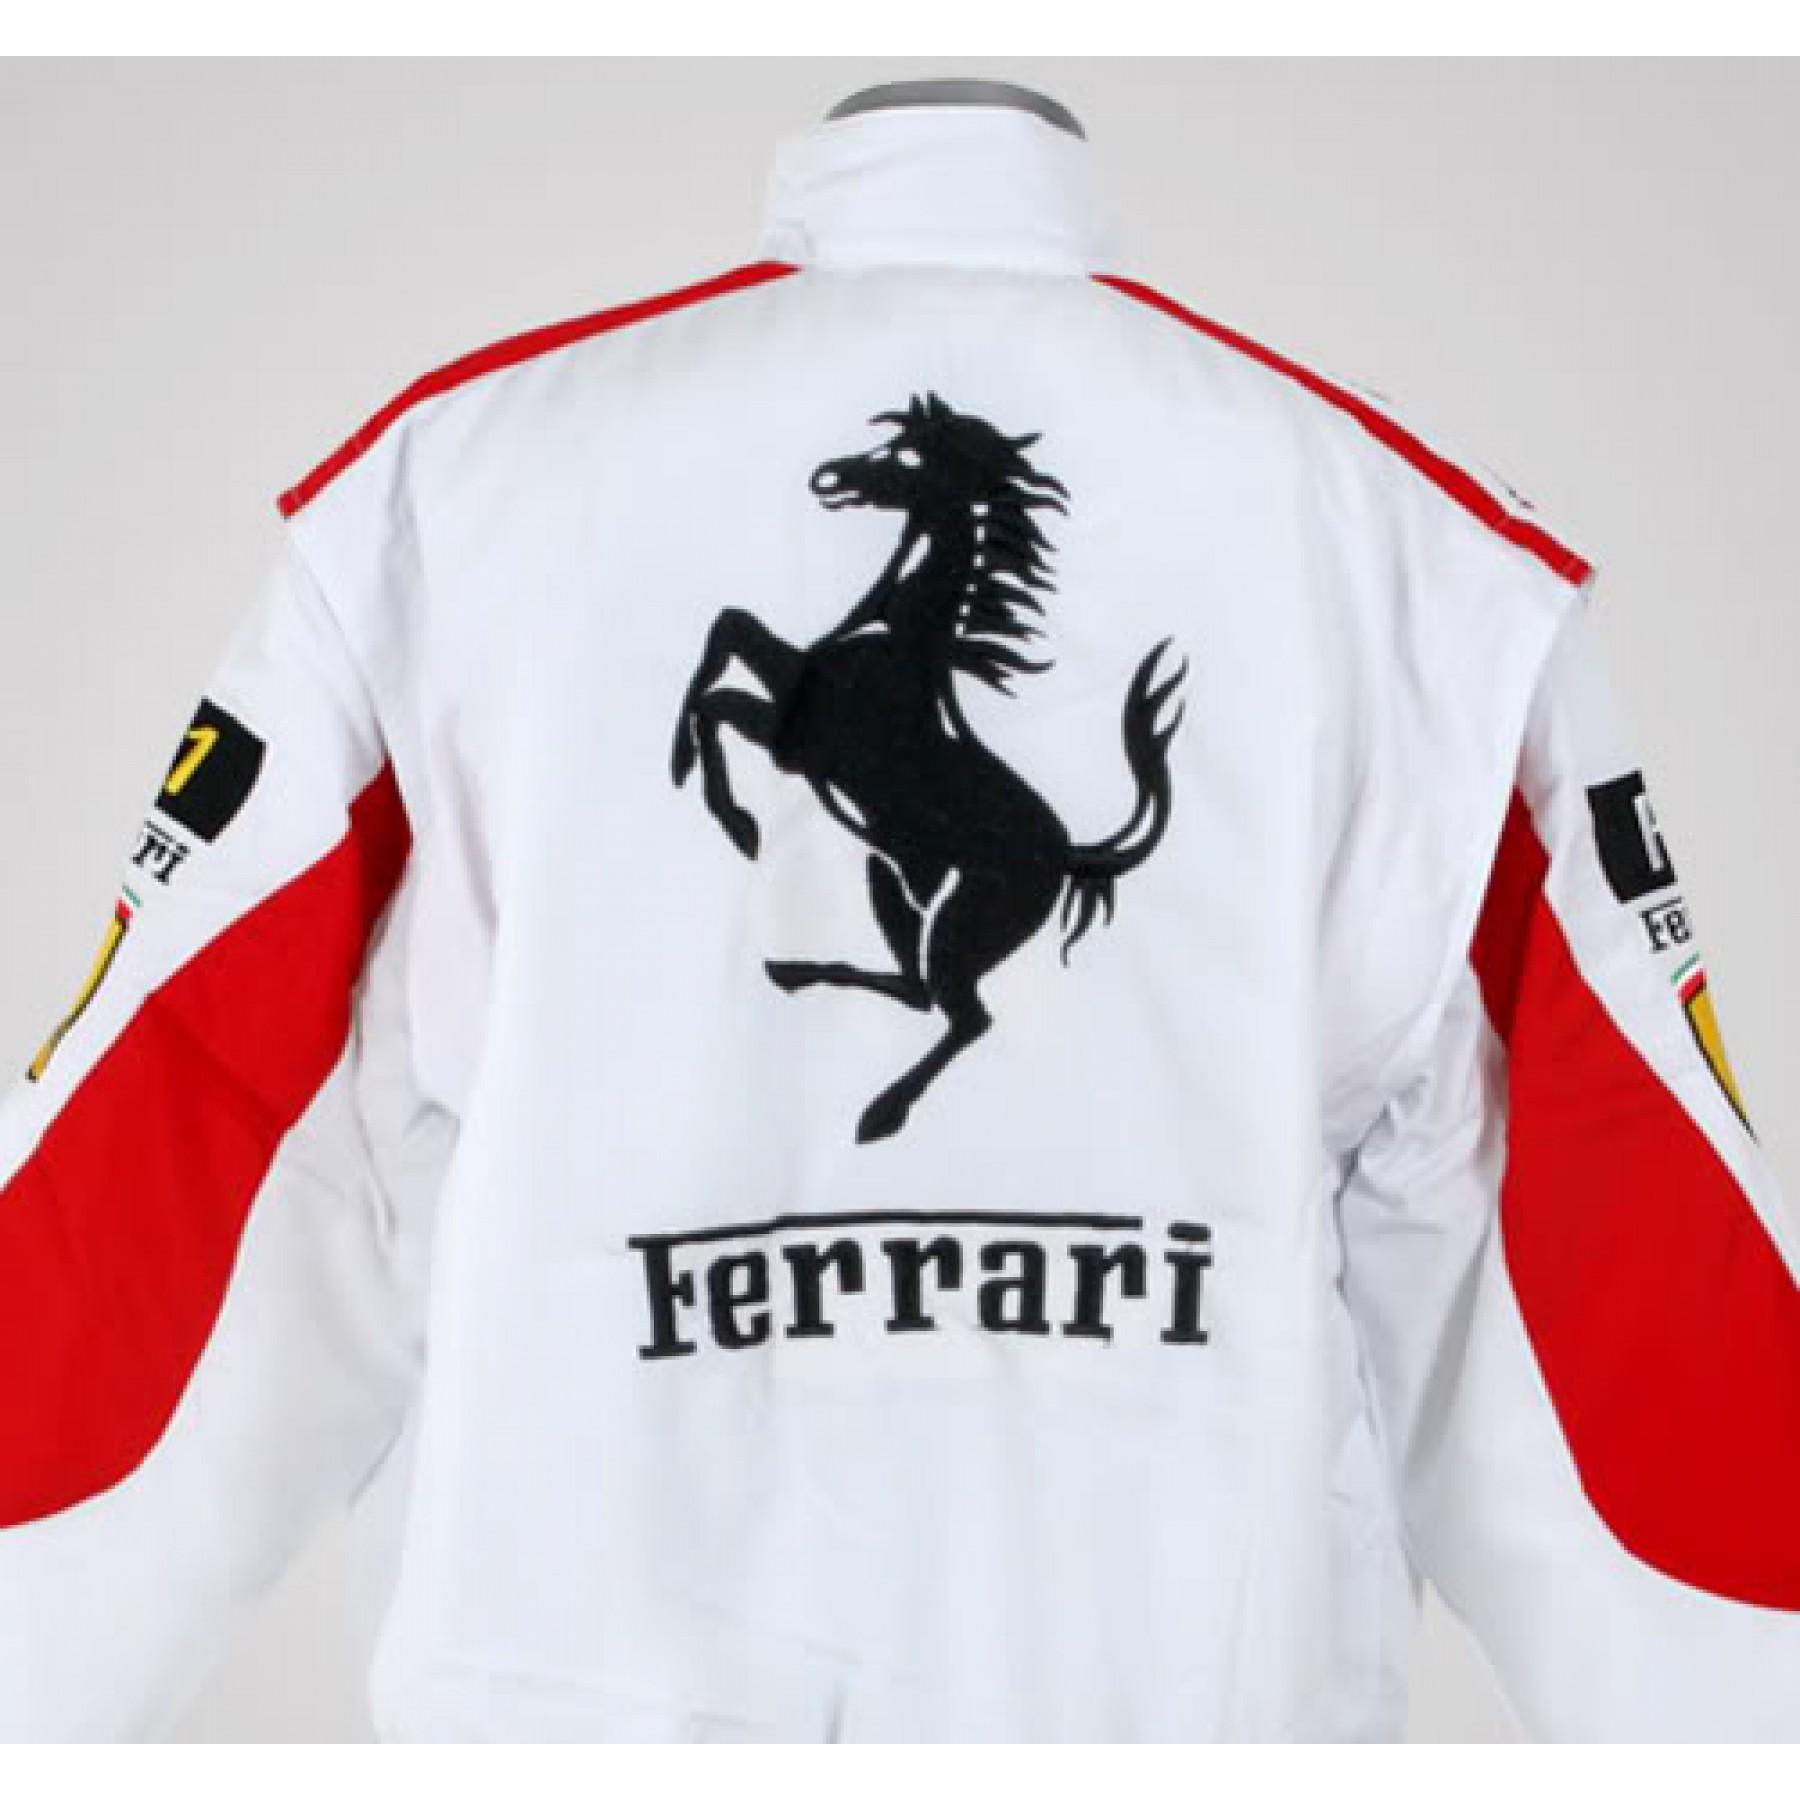 Jaqueta Branca e Vermelha Ferrari - Cod 0320 111ff2d44ff